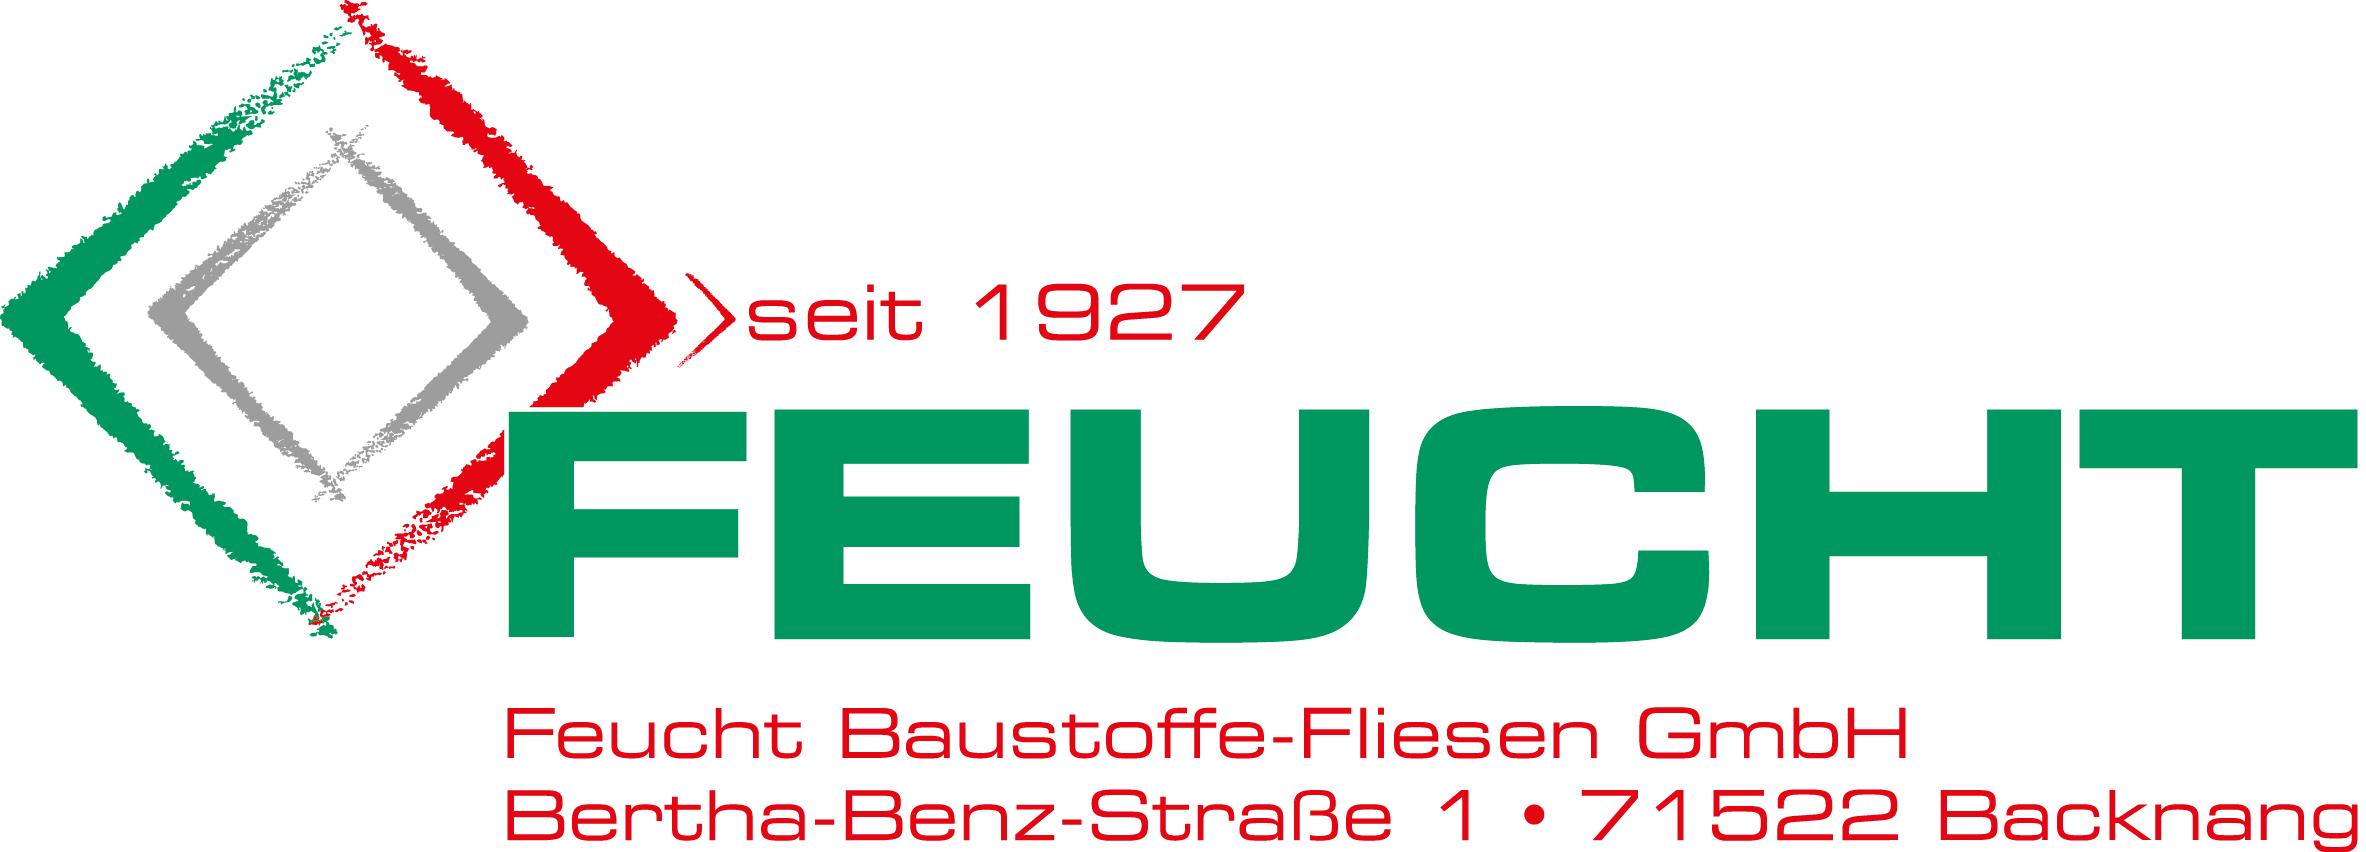 Feucht Baustoffe Fliesen GmbH